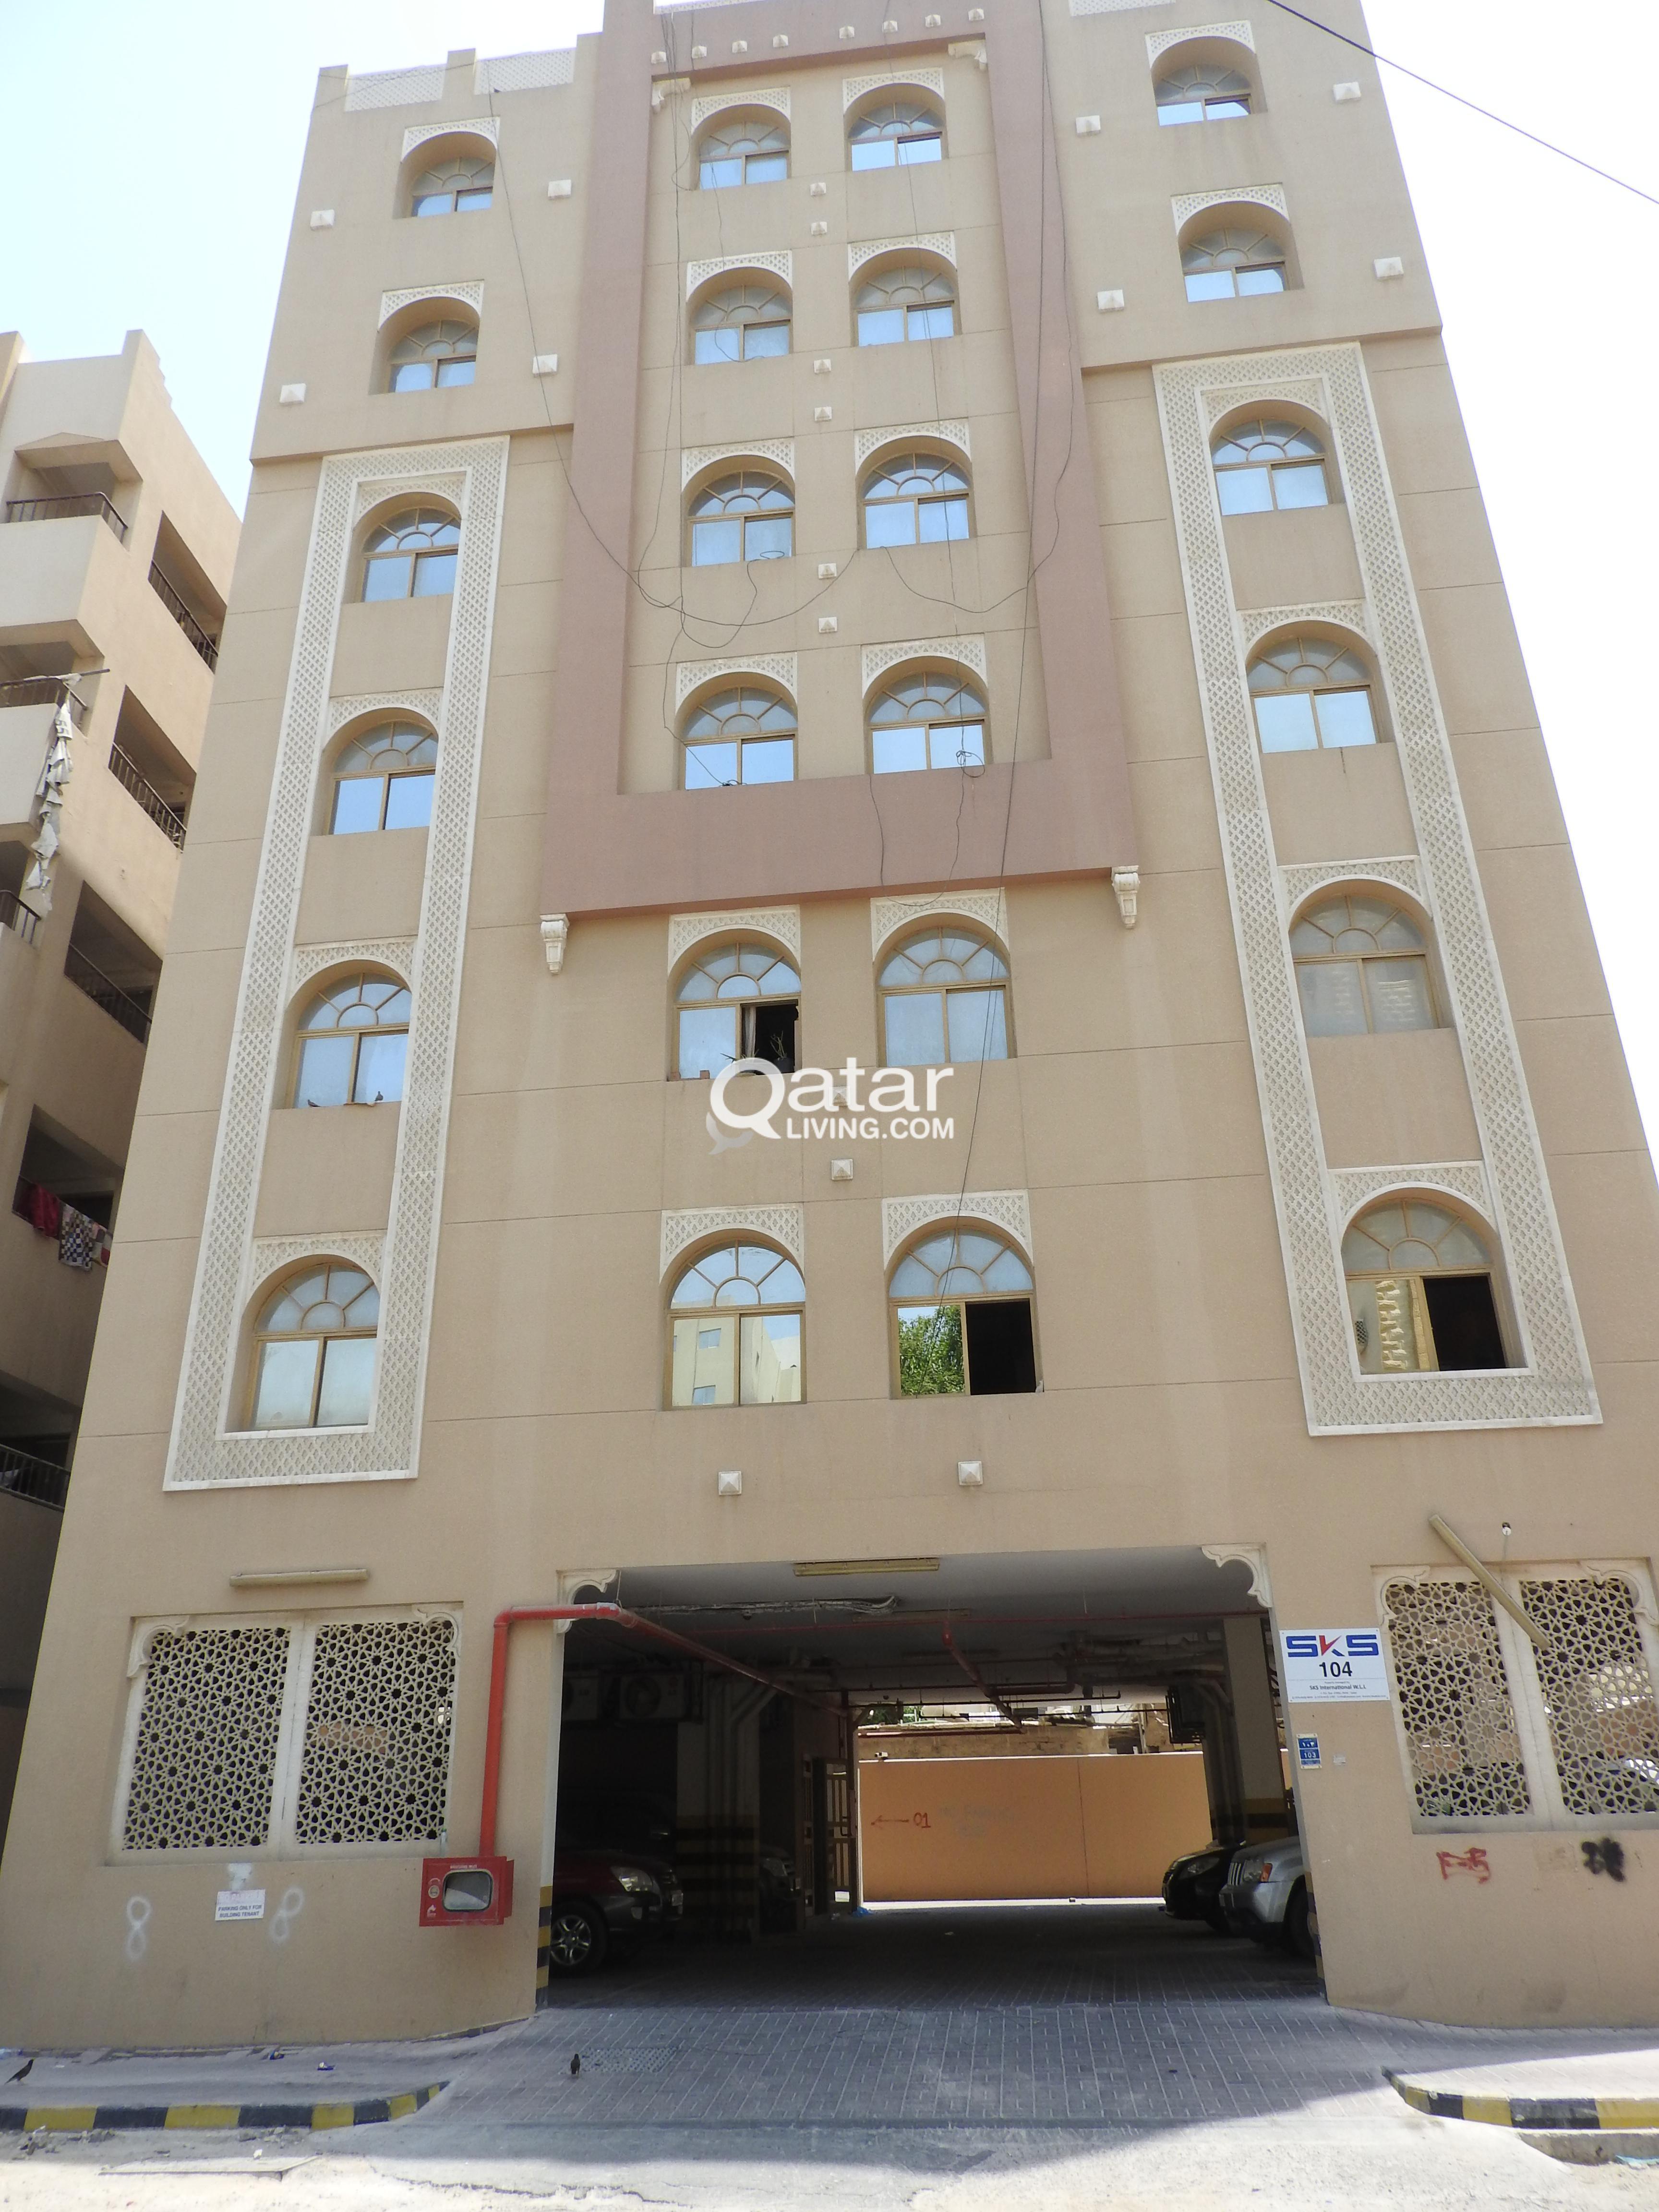 Apartment for rent in Qatar | Qatar Living Properties